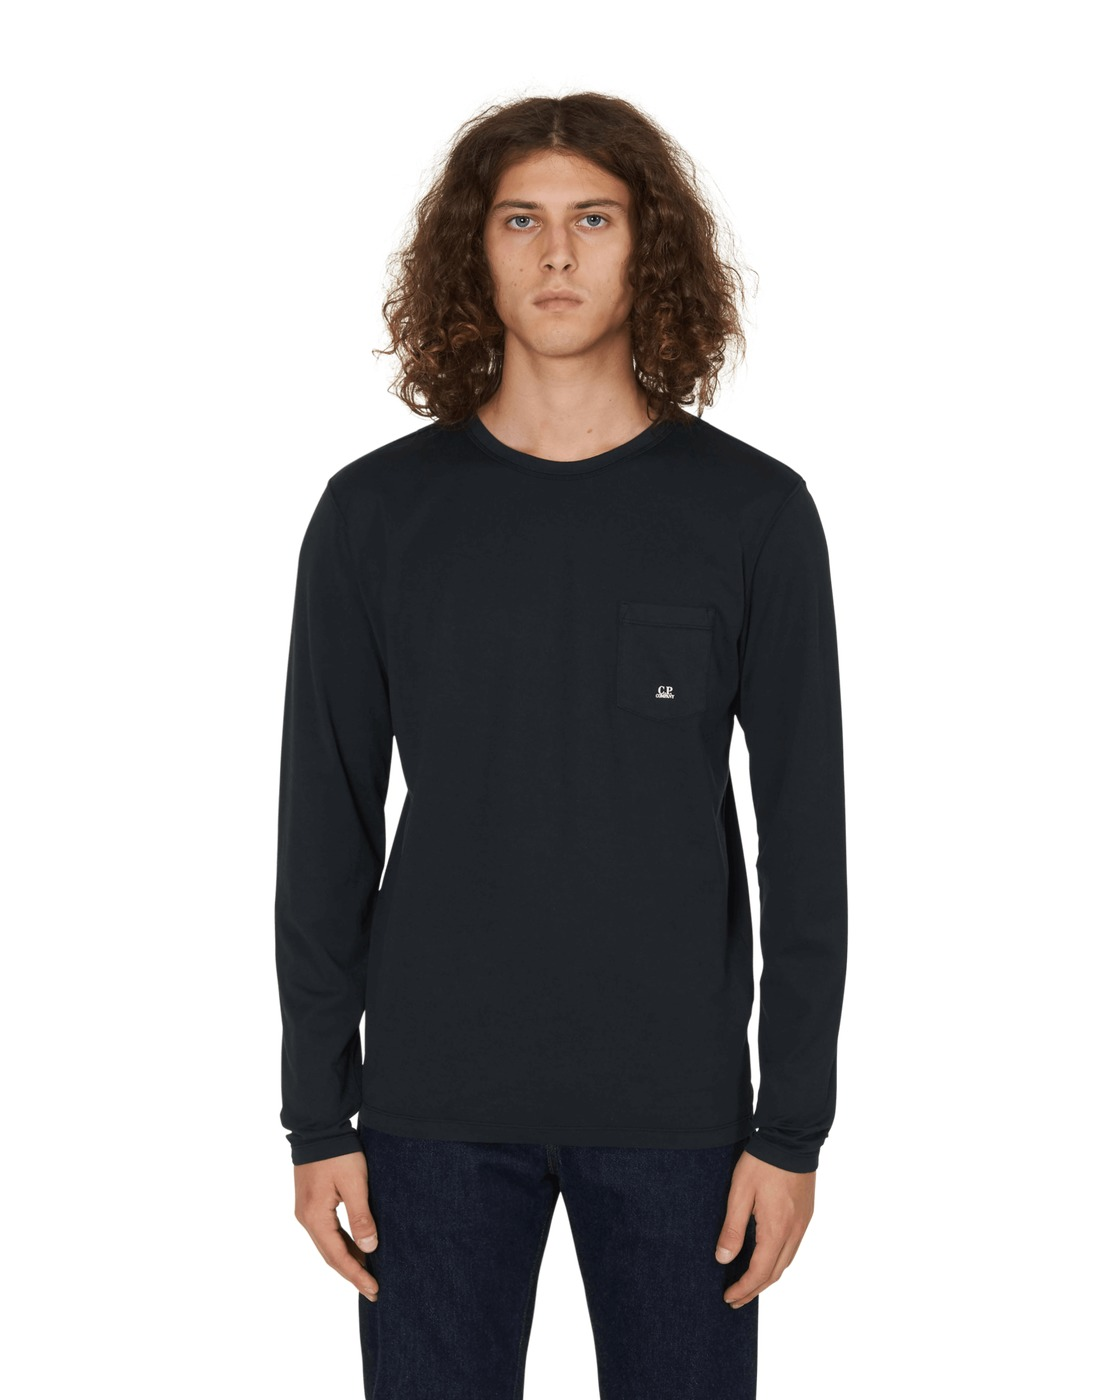 C.P. Company Long Sleeves T Shirt Black